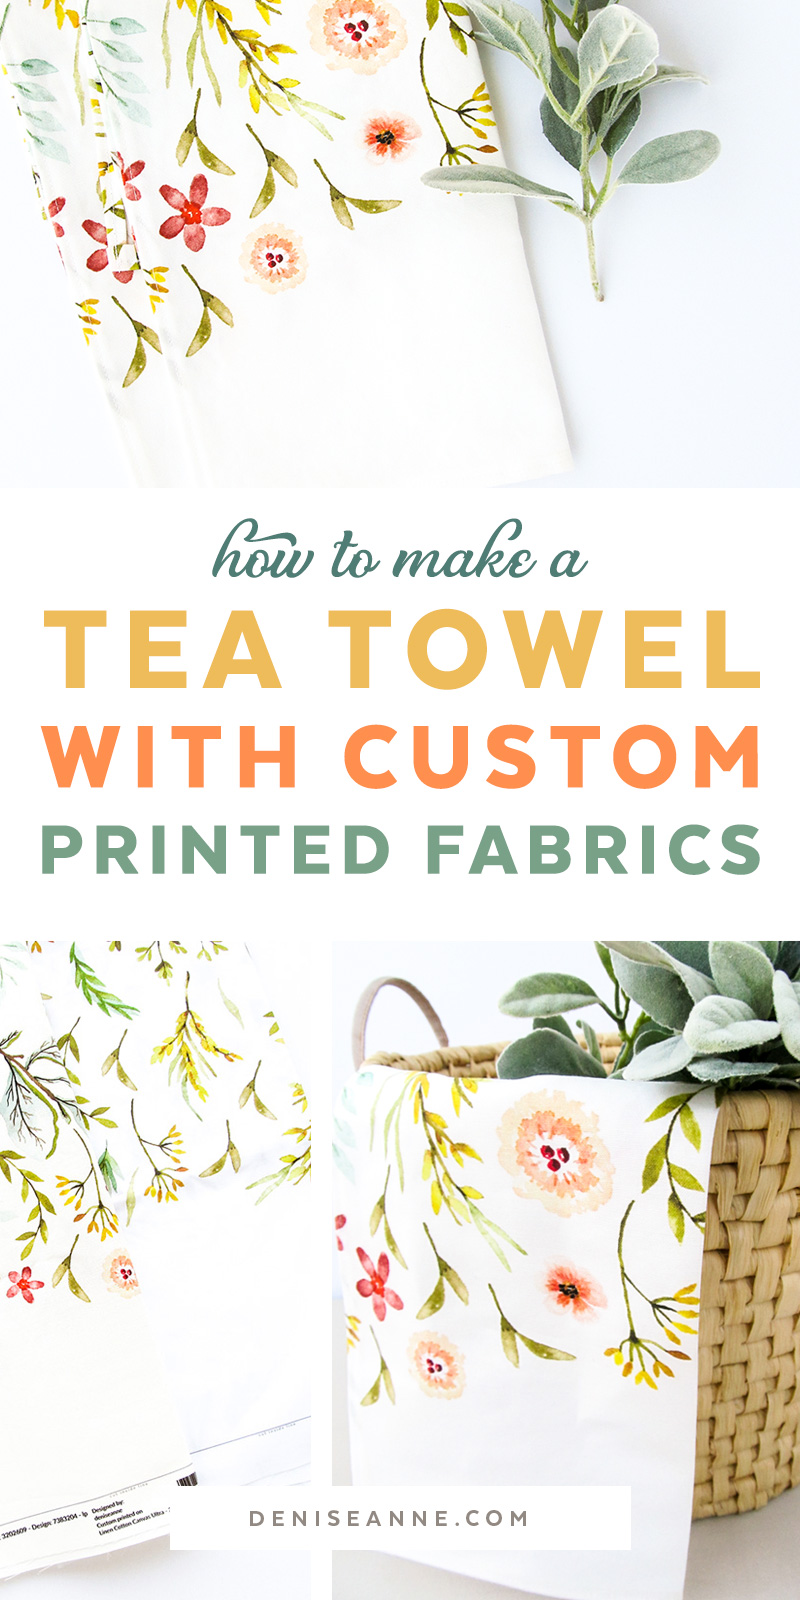 Making Tea Towels With Custom Printed Fabrics, Botancial Wildflower Kitchen  Towels.